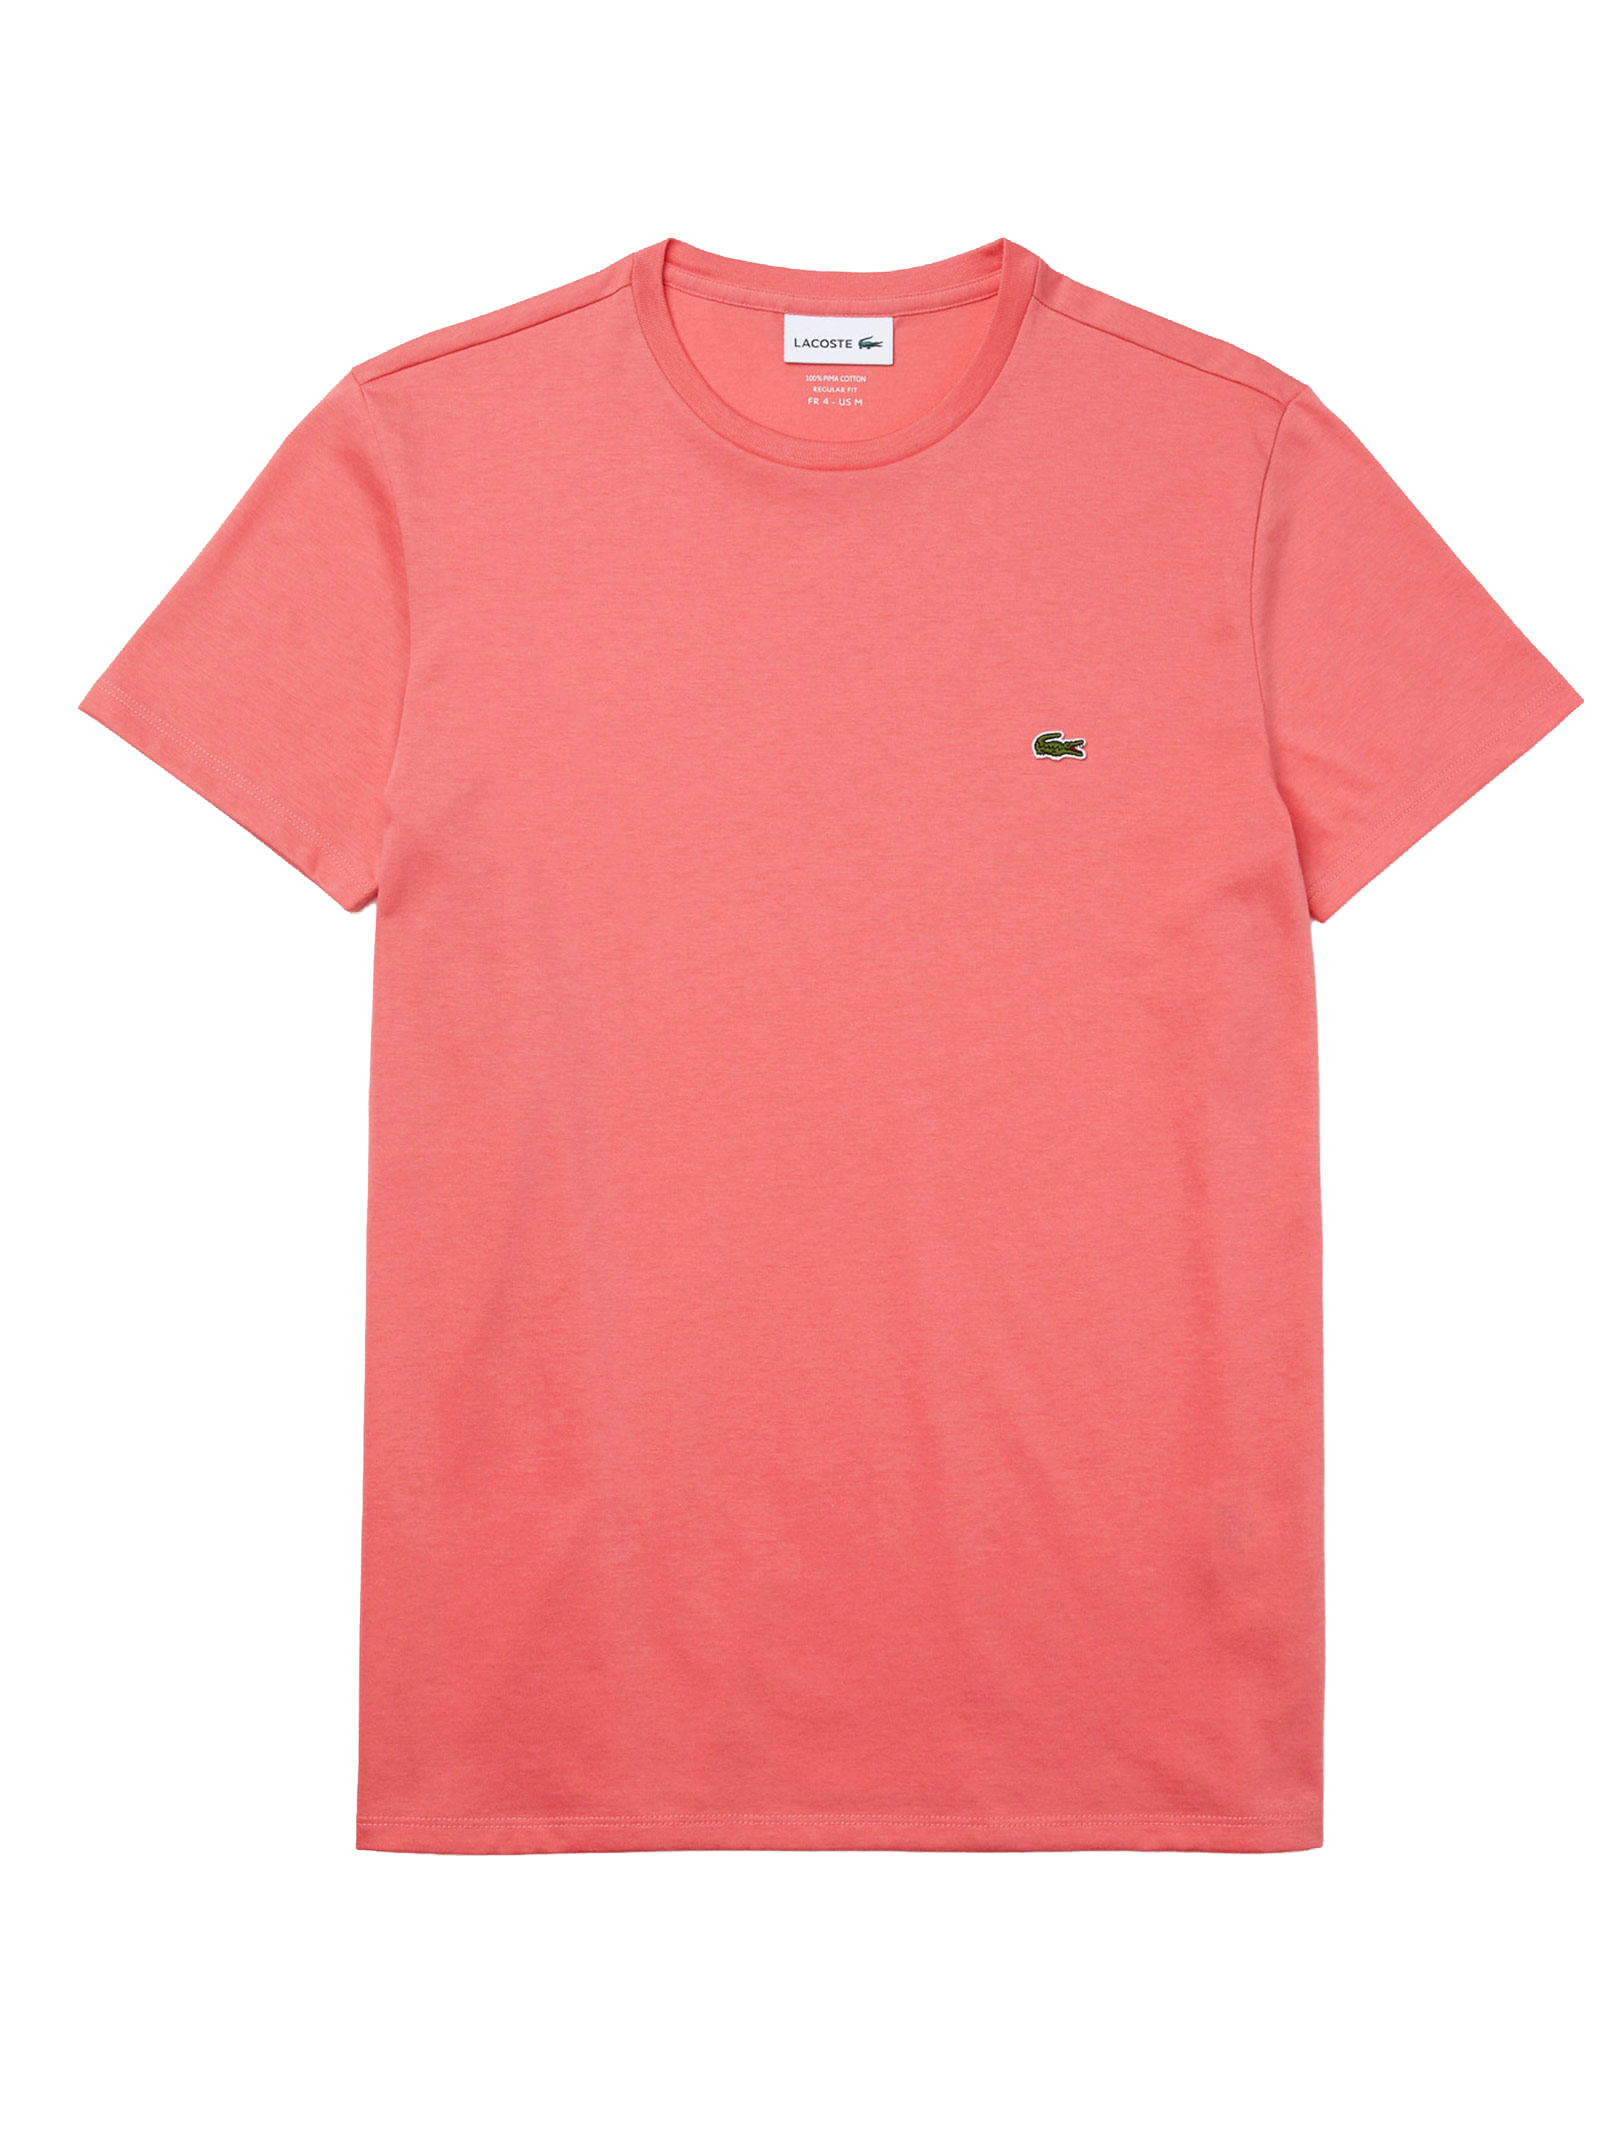 T-shirt a girocollo rosa LACOSTE | T-shirt | TH6709F9C